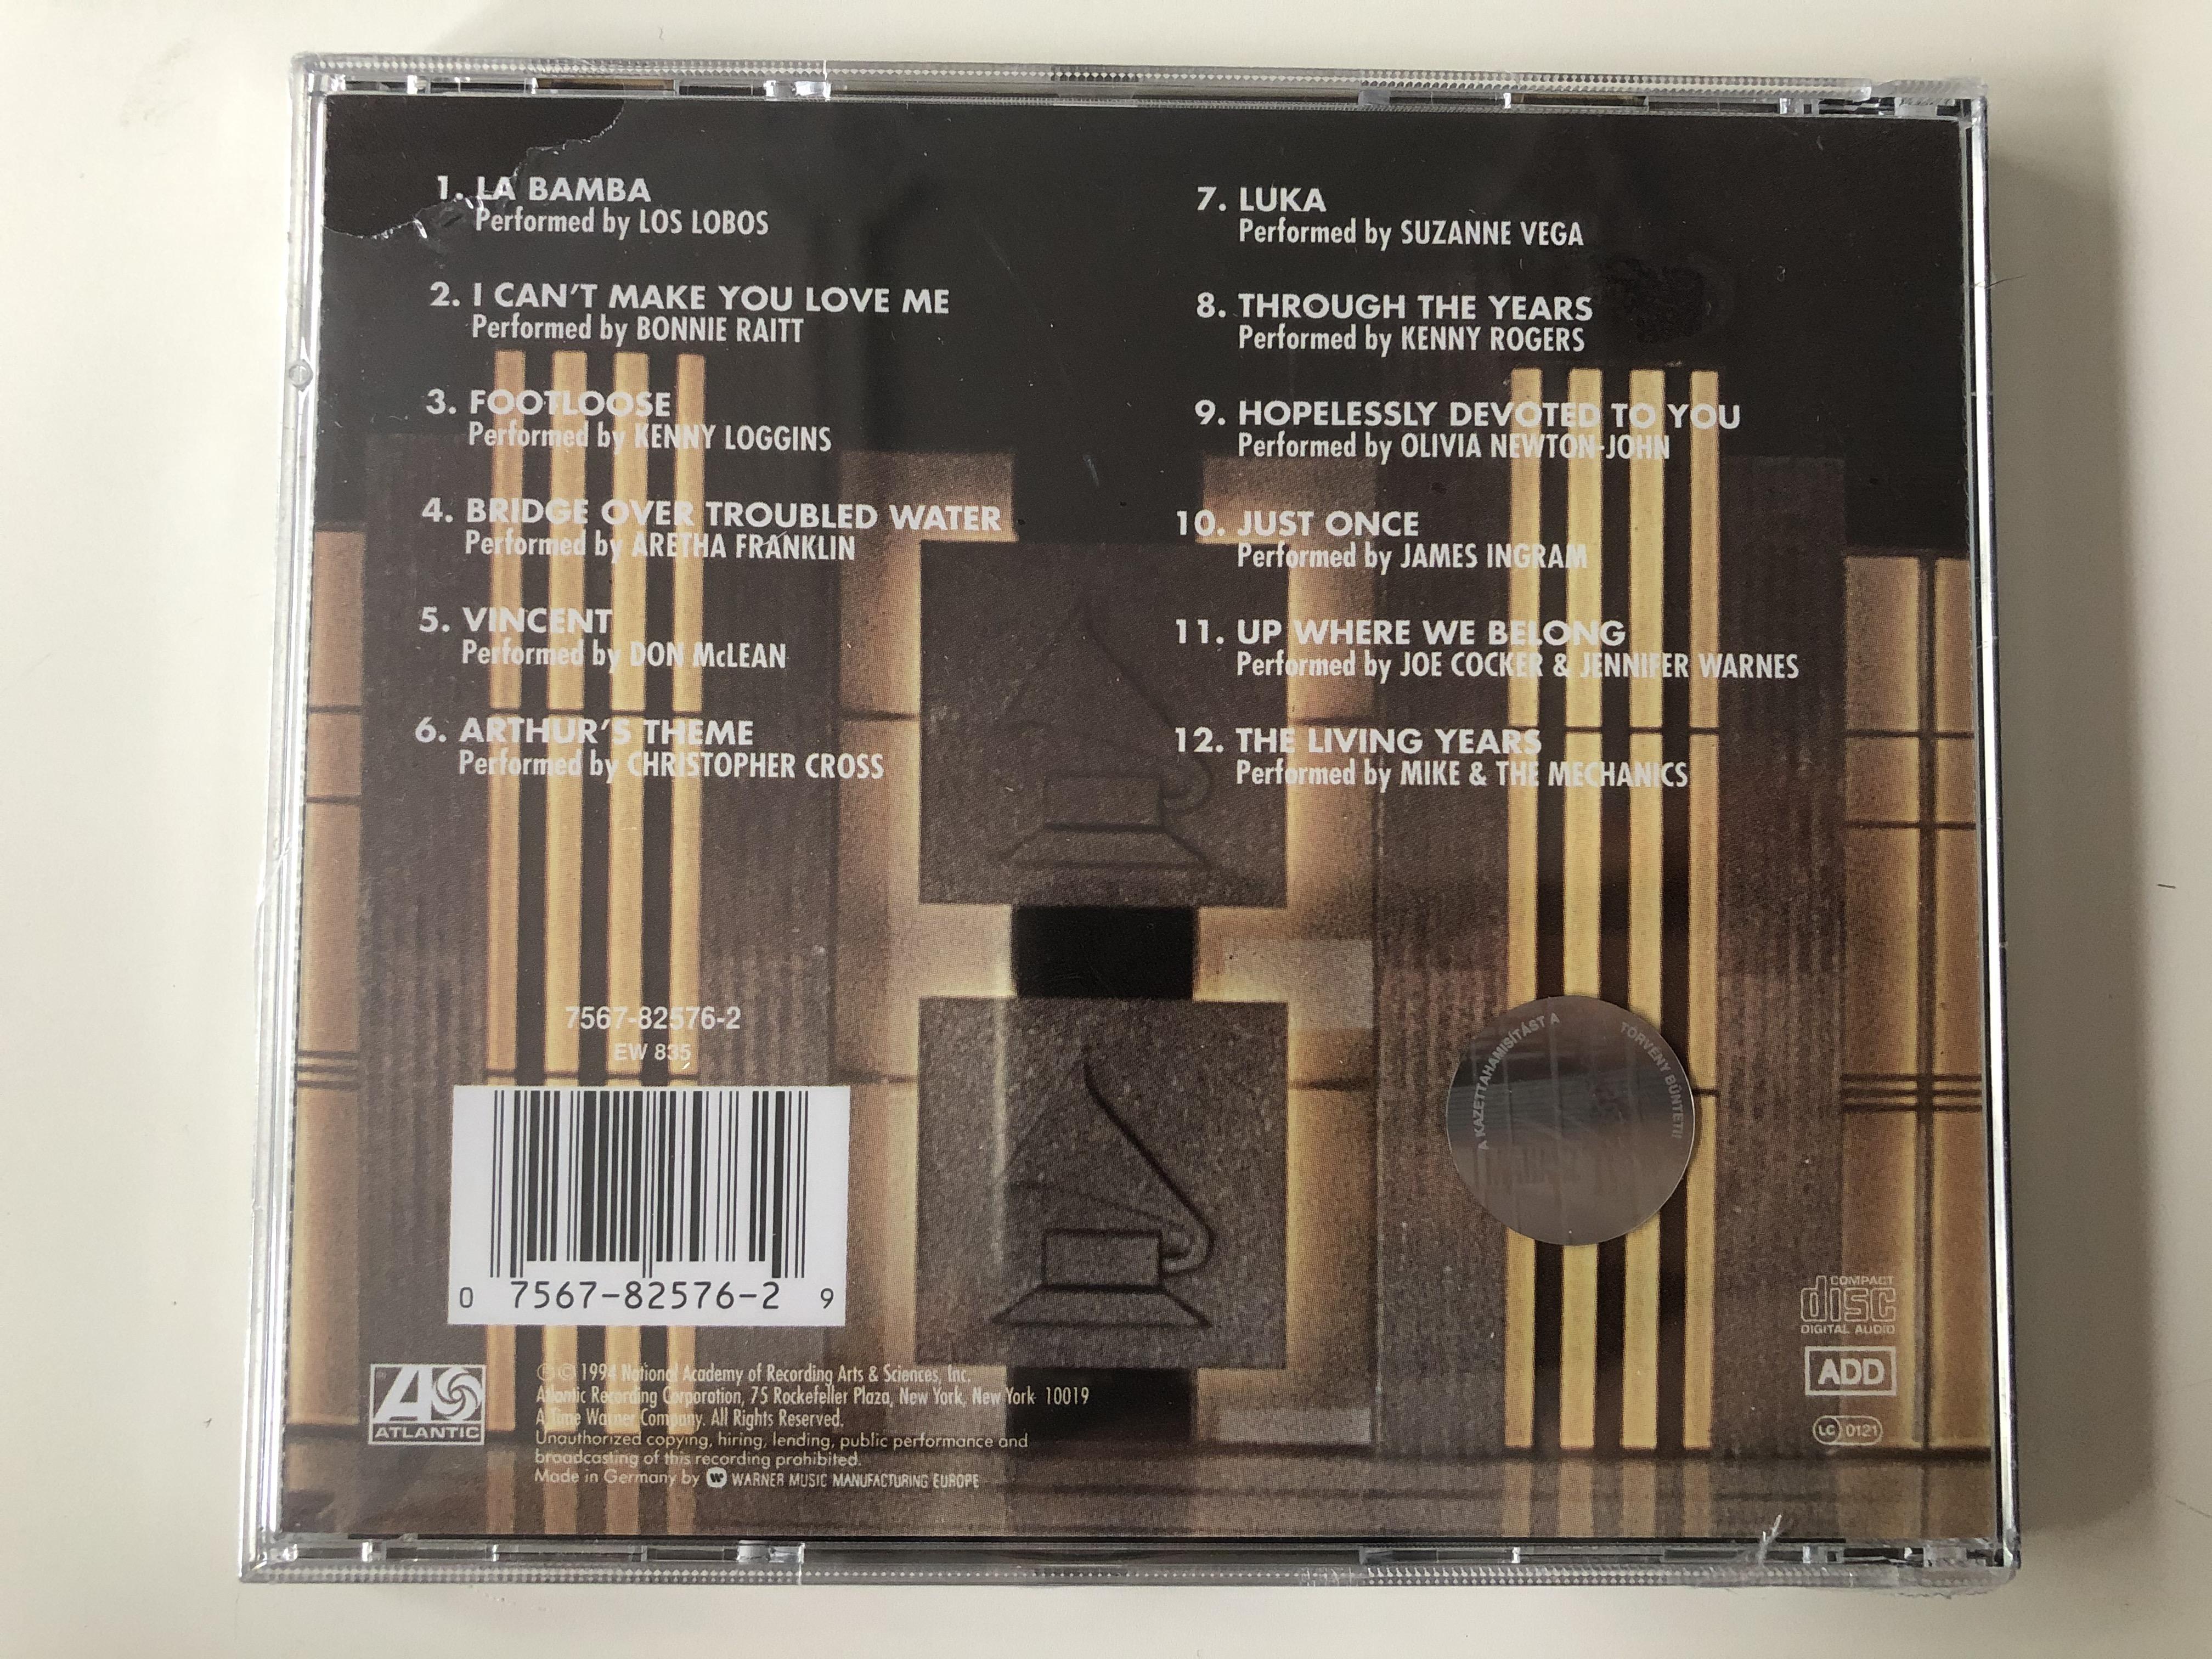 grammy-s-greatest-moments-volume-iii-atlantic-audio-cd-1994-7567-82576-2-2-.jpg